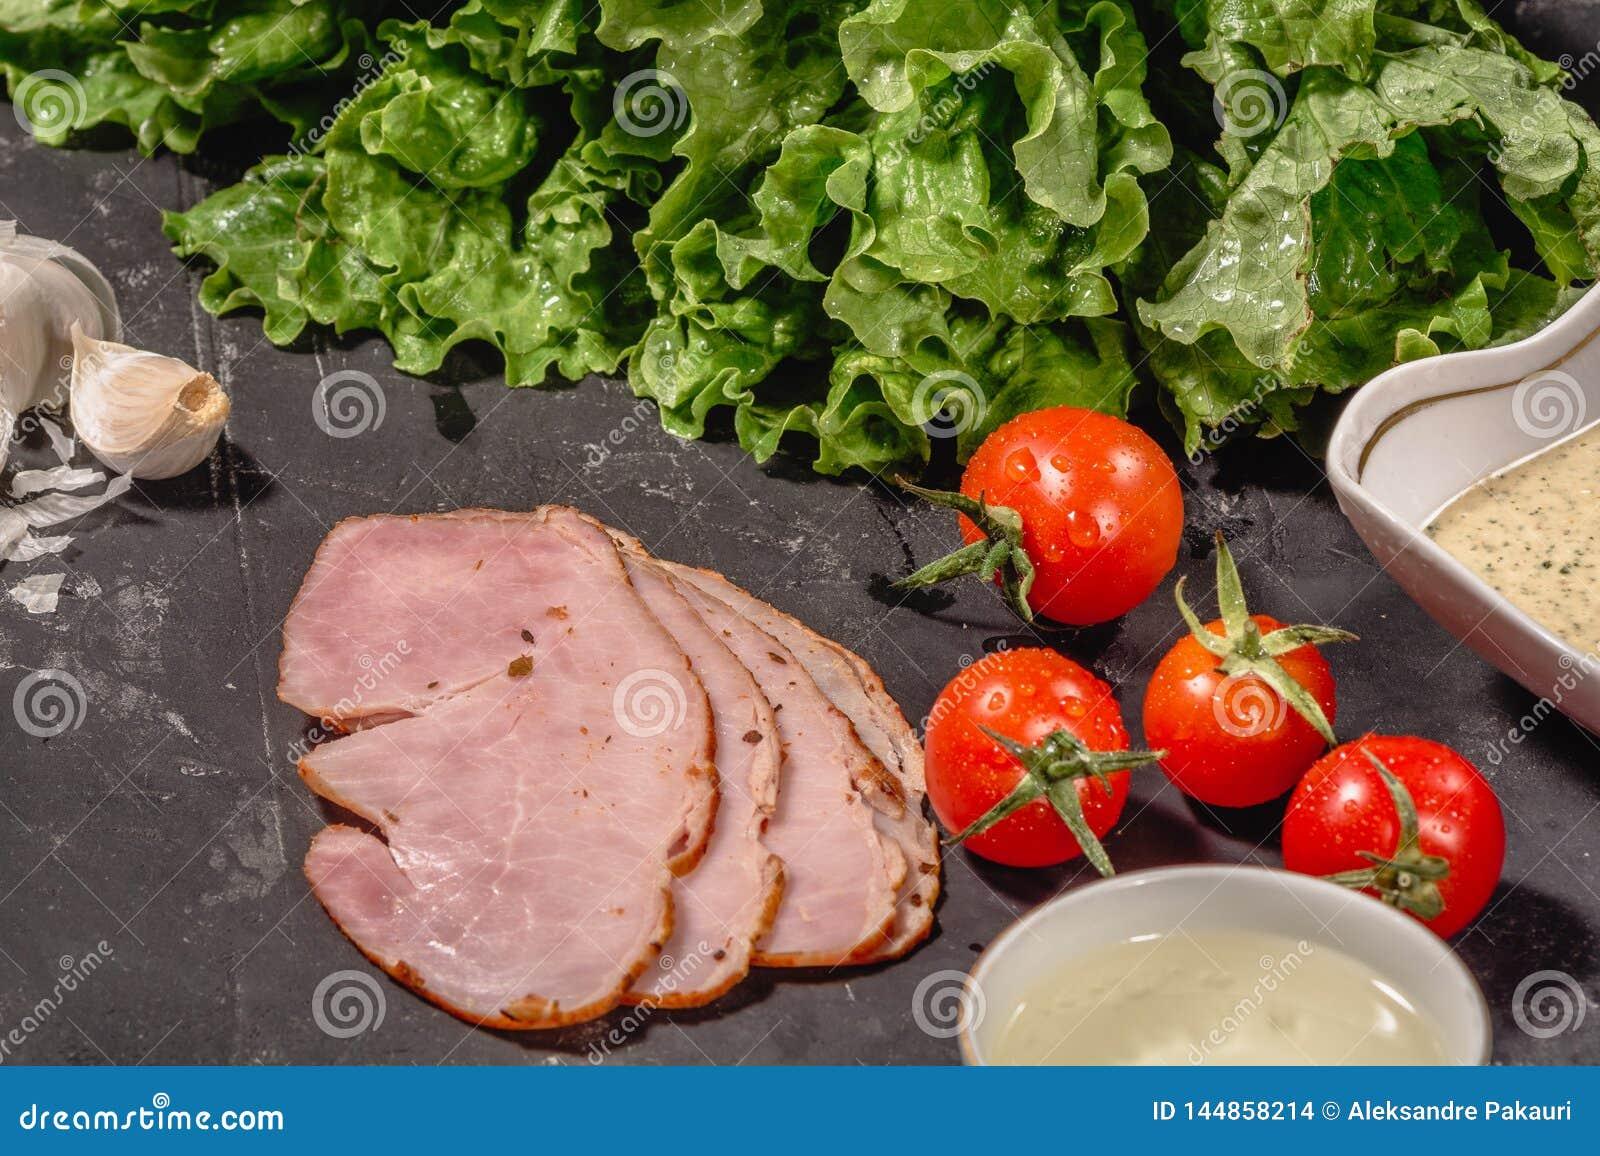 Ingredients for cooking Italian bruschetta on dark table. Italian bruschetta with cherry tomatoes, cheese sauce, salad leaves,